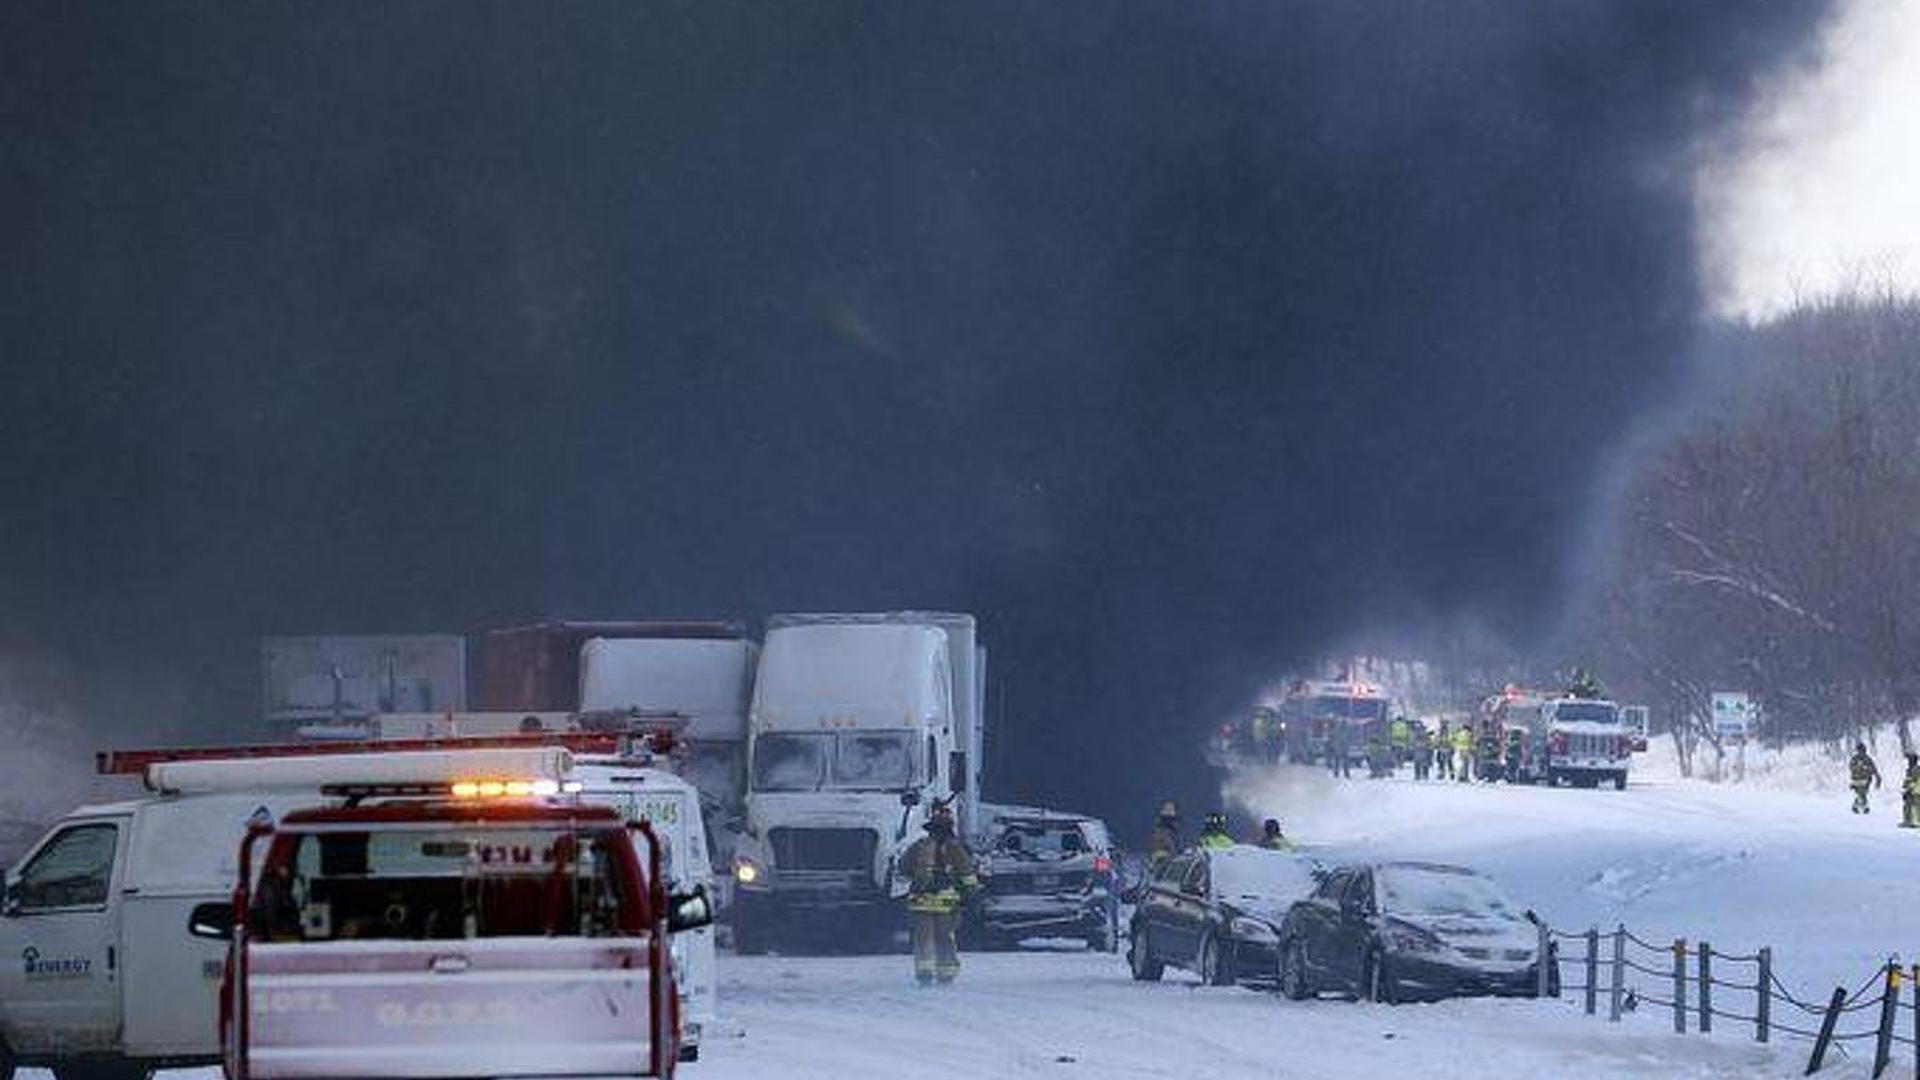 193 vehicles involved in a massive highway crash near Michigan [video]